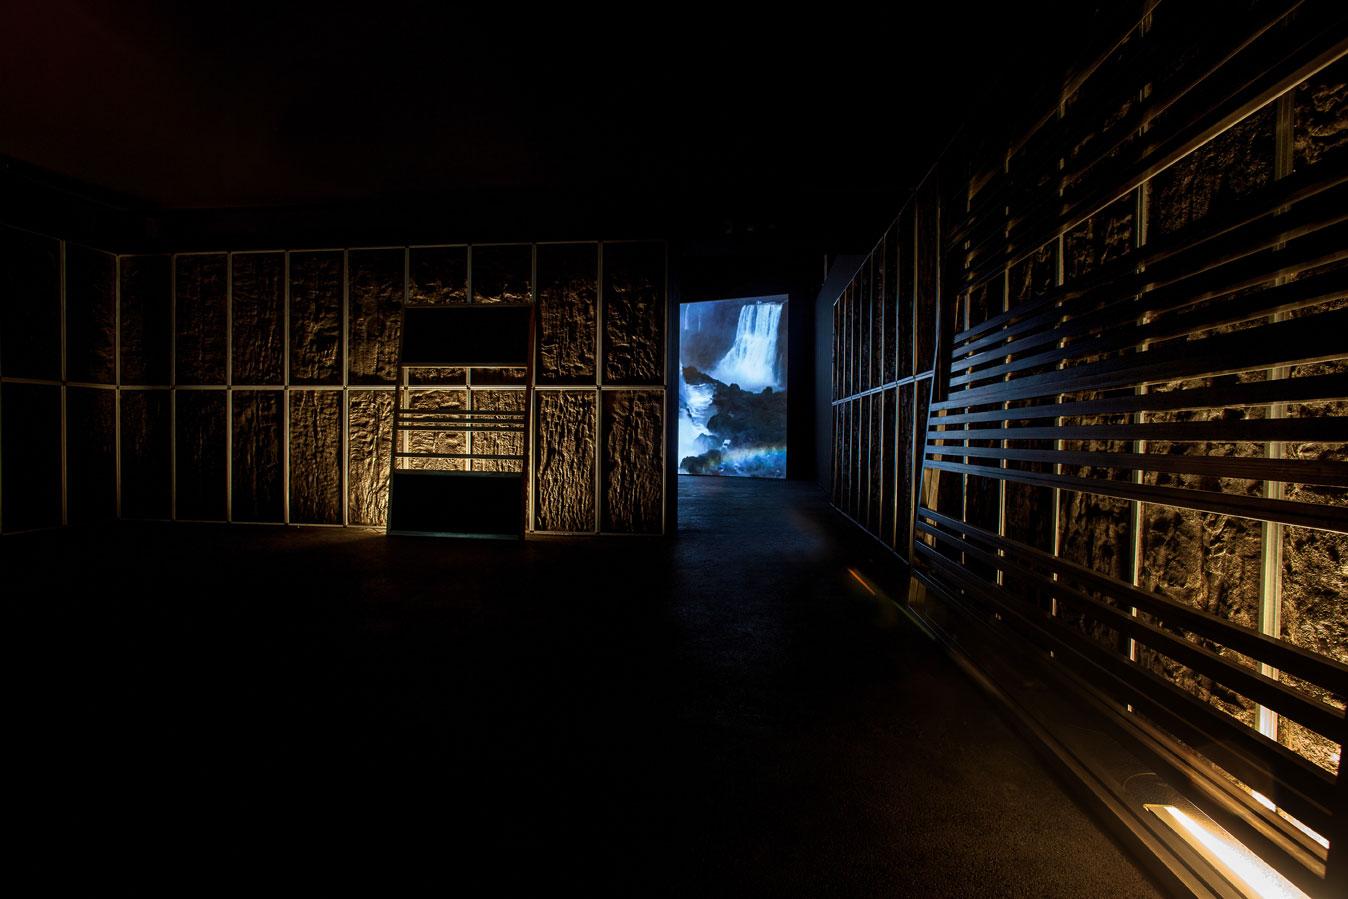 Chambre du silence, 2013-14.